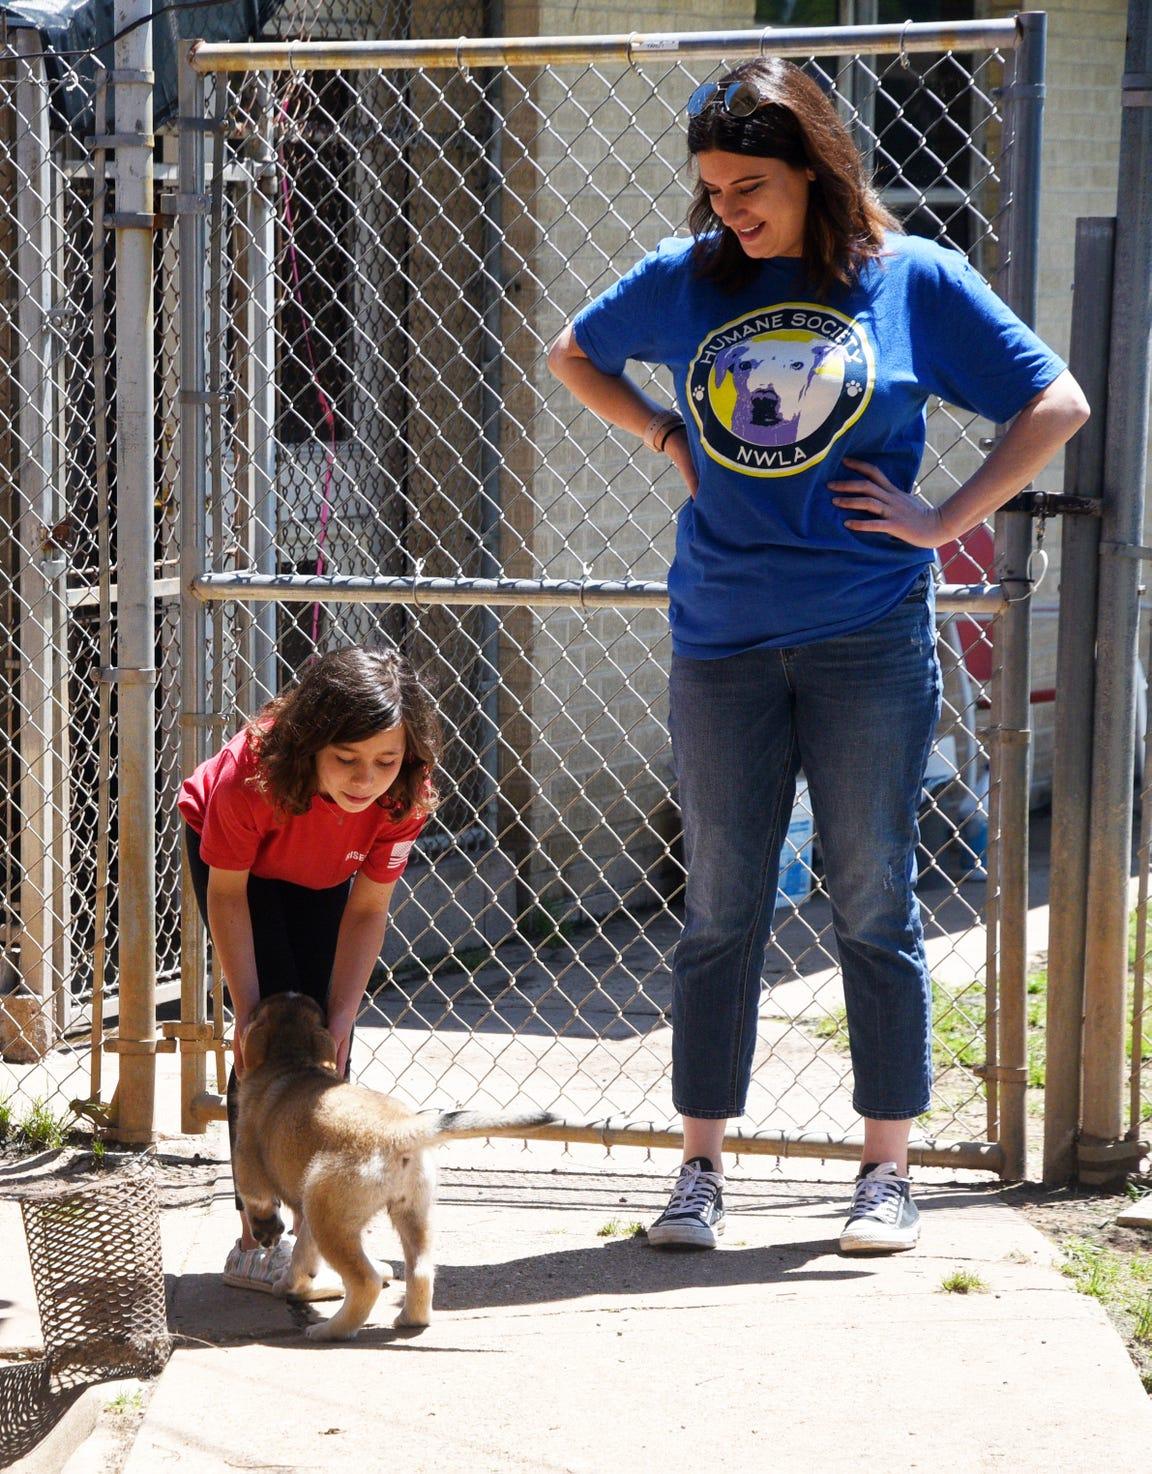 Volunteer Sarrah Walton, right, and Emma Jo Roppolo look at the puppies for adoption at the Humane Society of Northwest Louisiana.